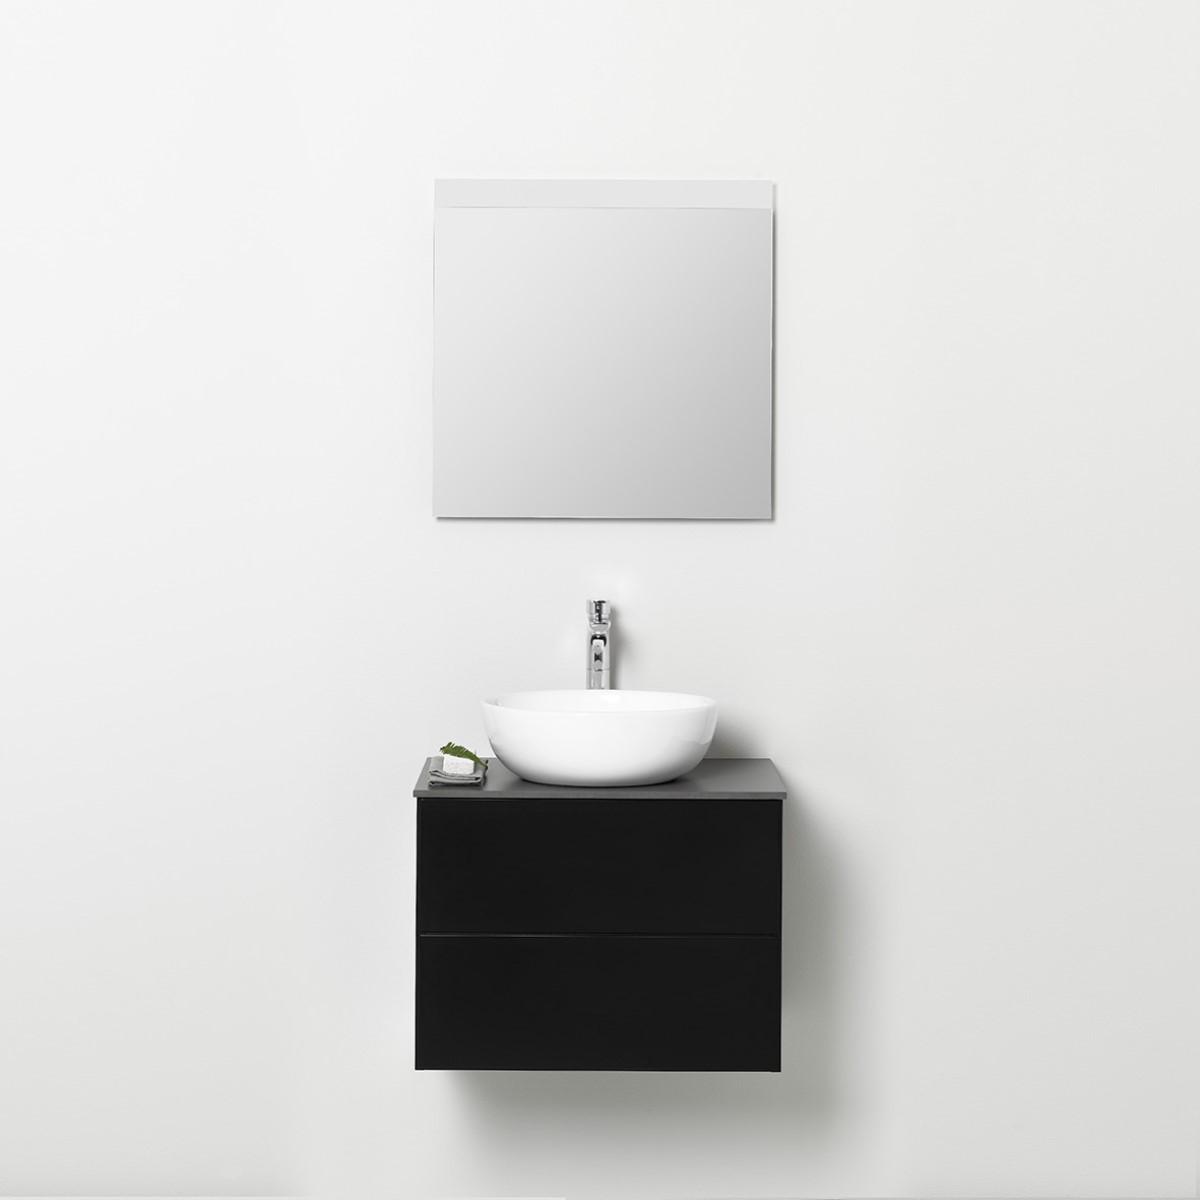 Möbelpaket Westerbergs Afton 600 med Spegel Svart